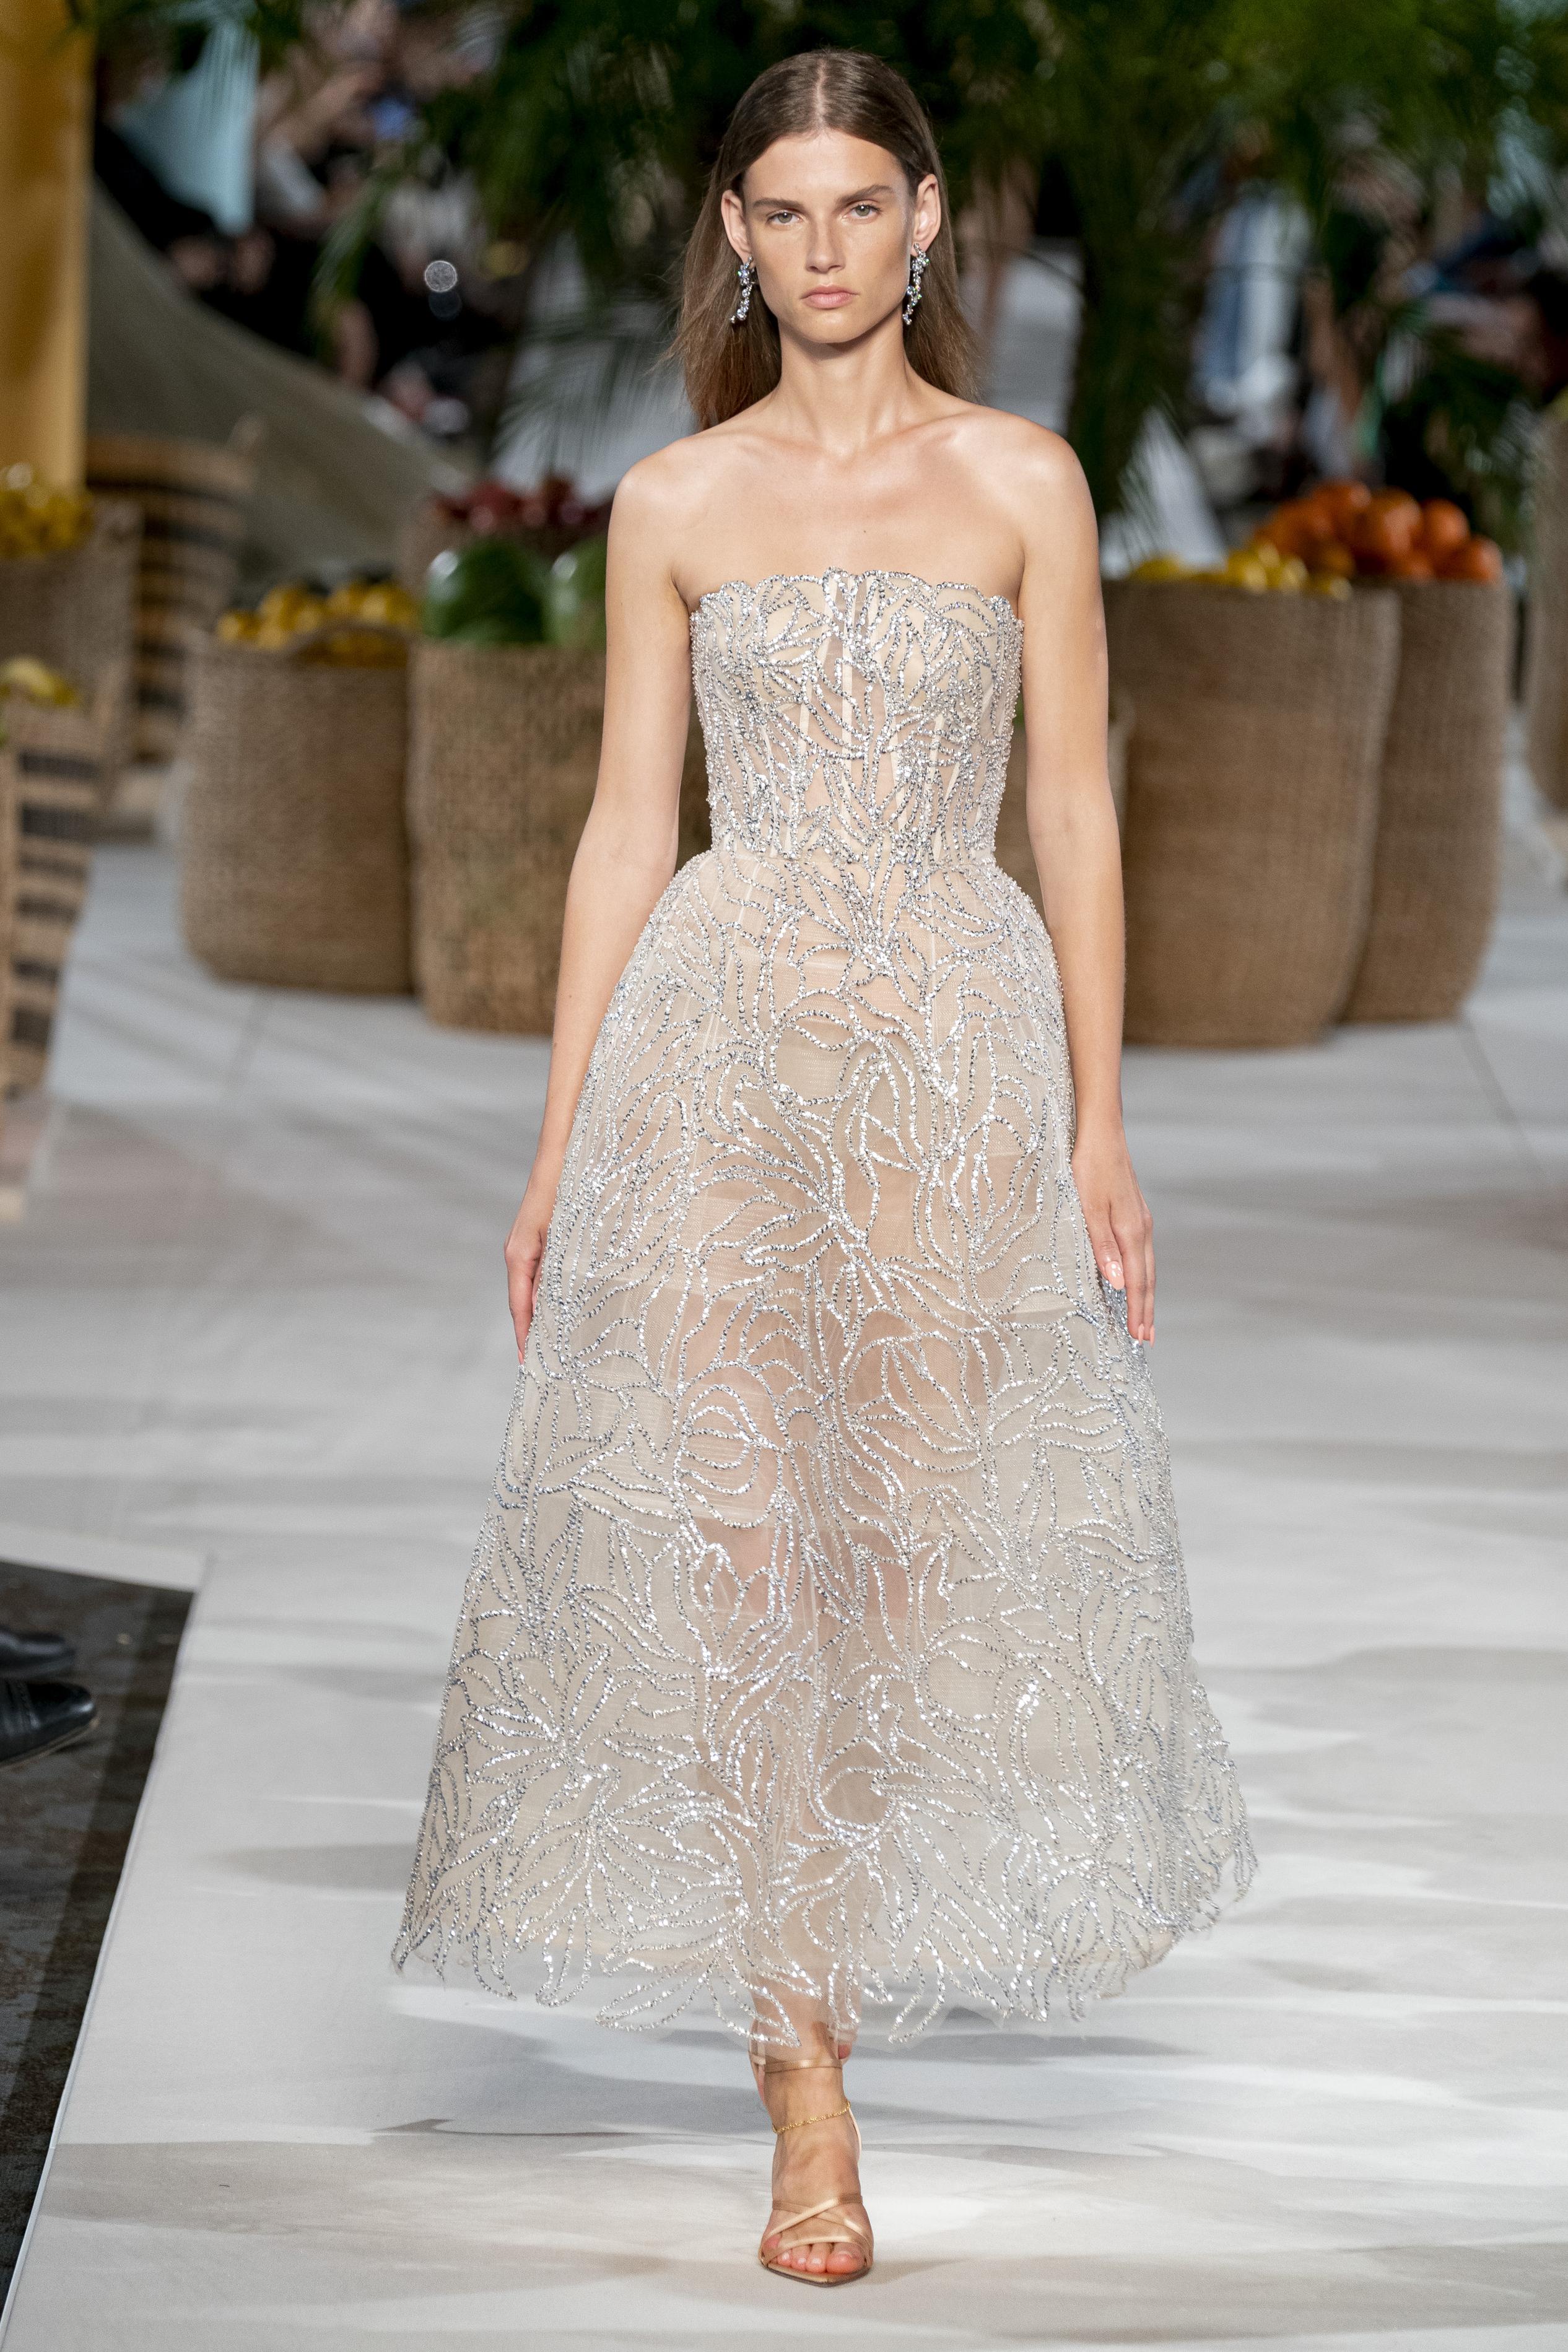 Best Designer Wedding Dresses The Fashion Desk Edit Porter,Dress For Beach Wedding Guest 2020